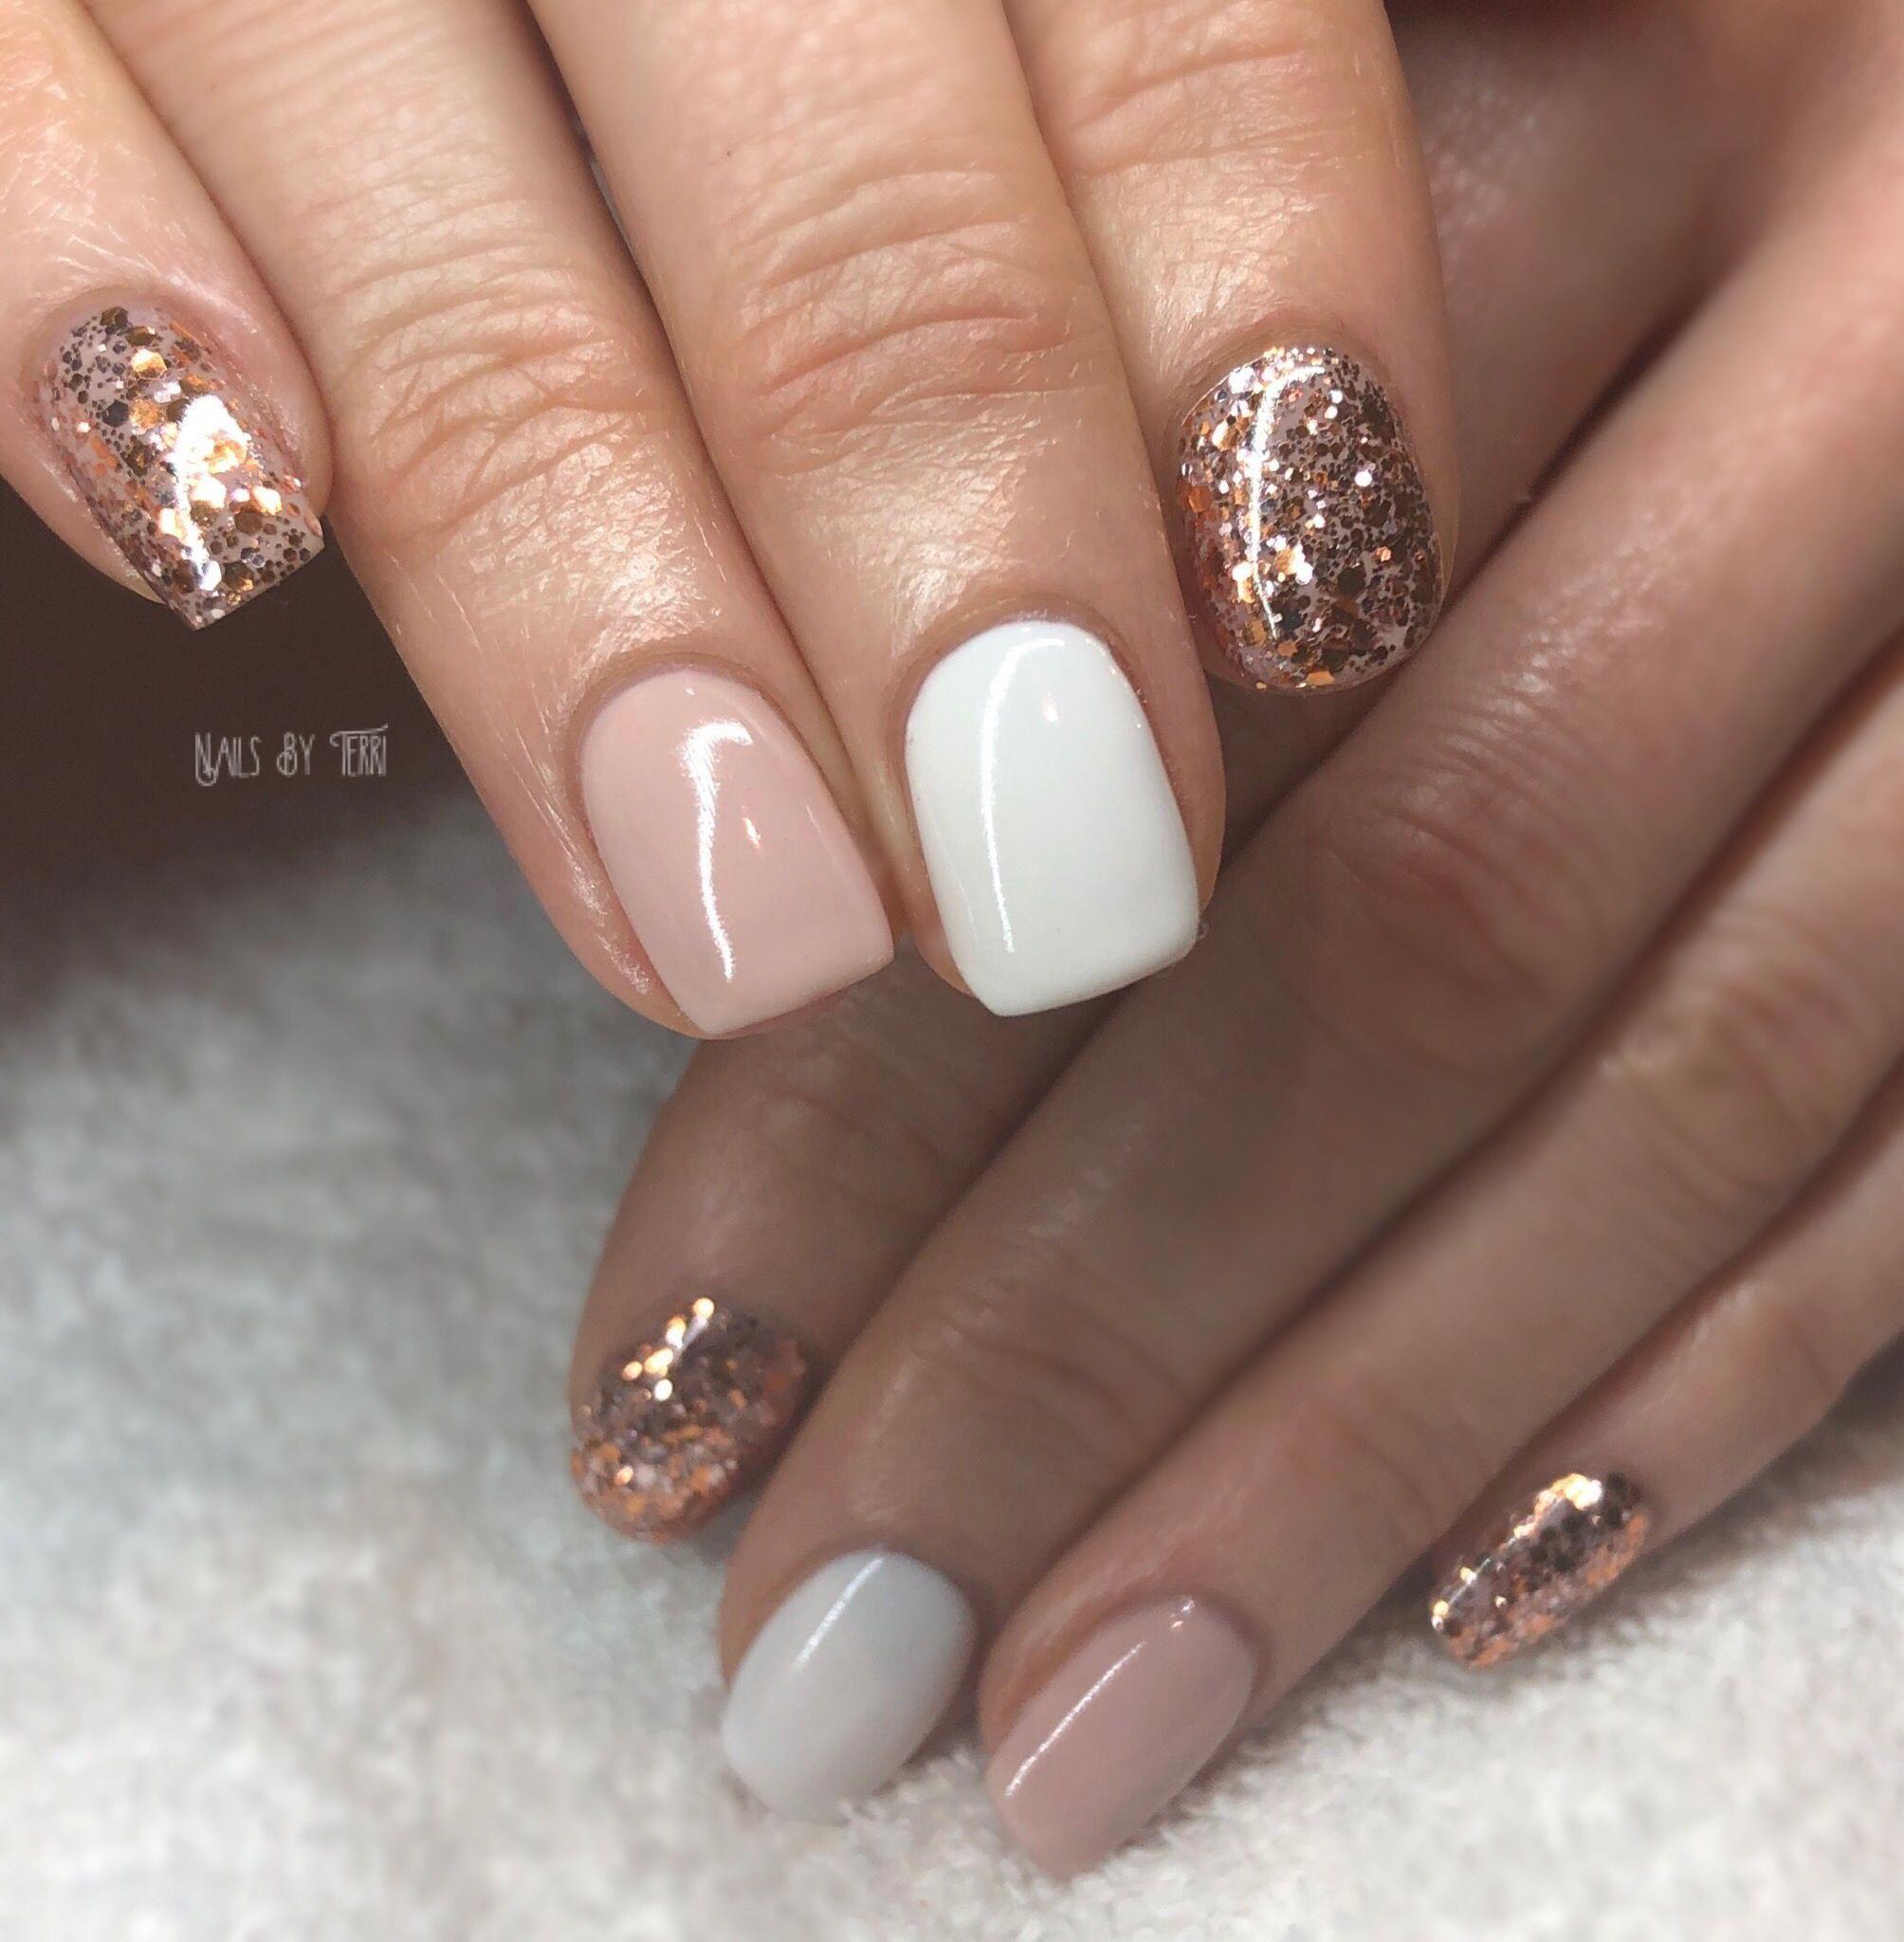 Here Are The 10 Most Popular Nail Polish Colors At Opi Glitter Gel Nails Gold Nails Toe Nails